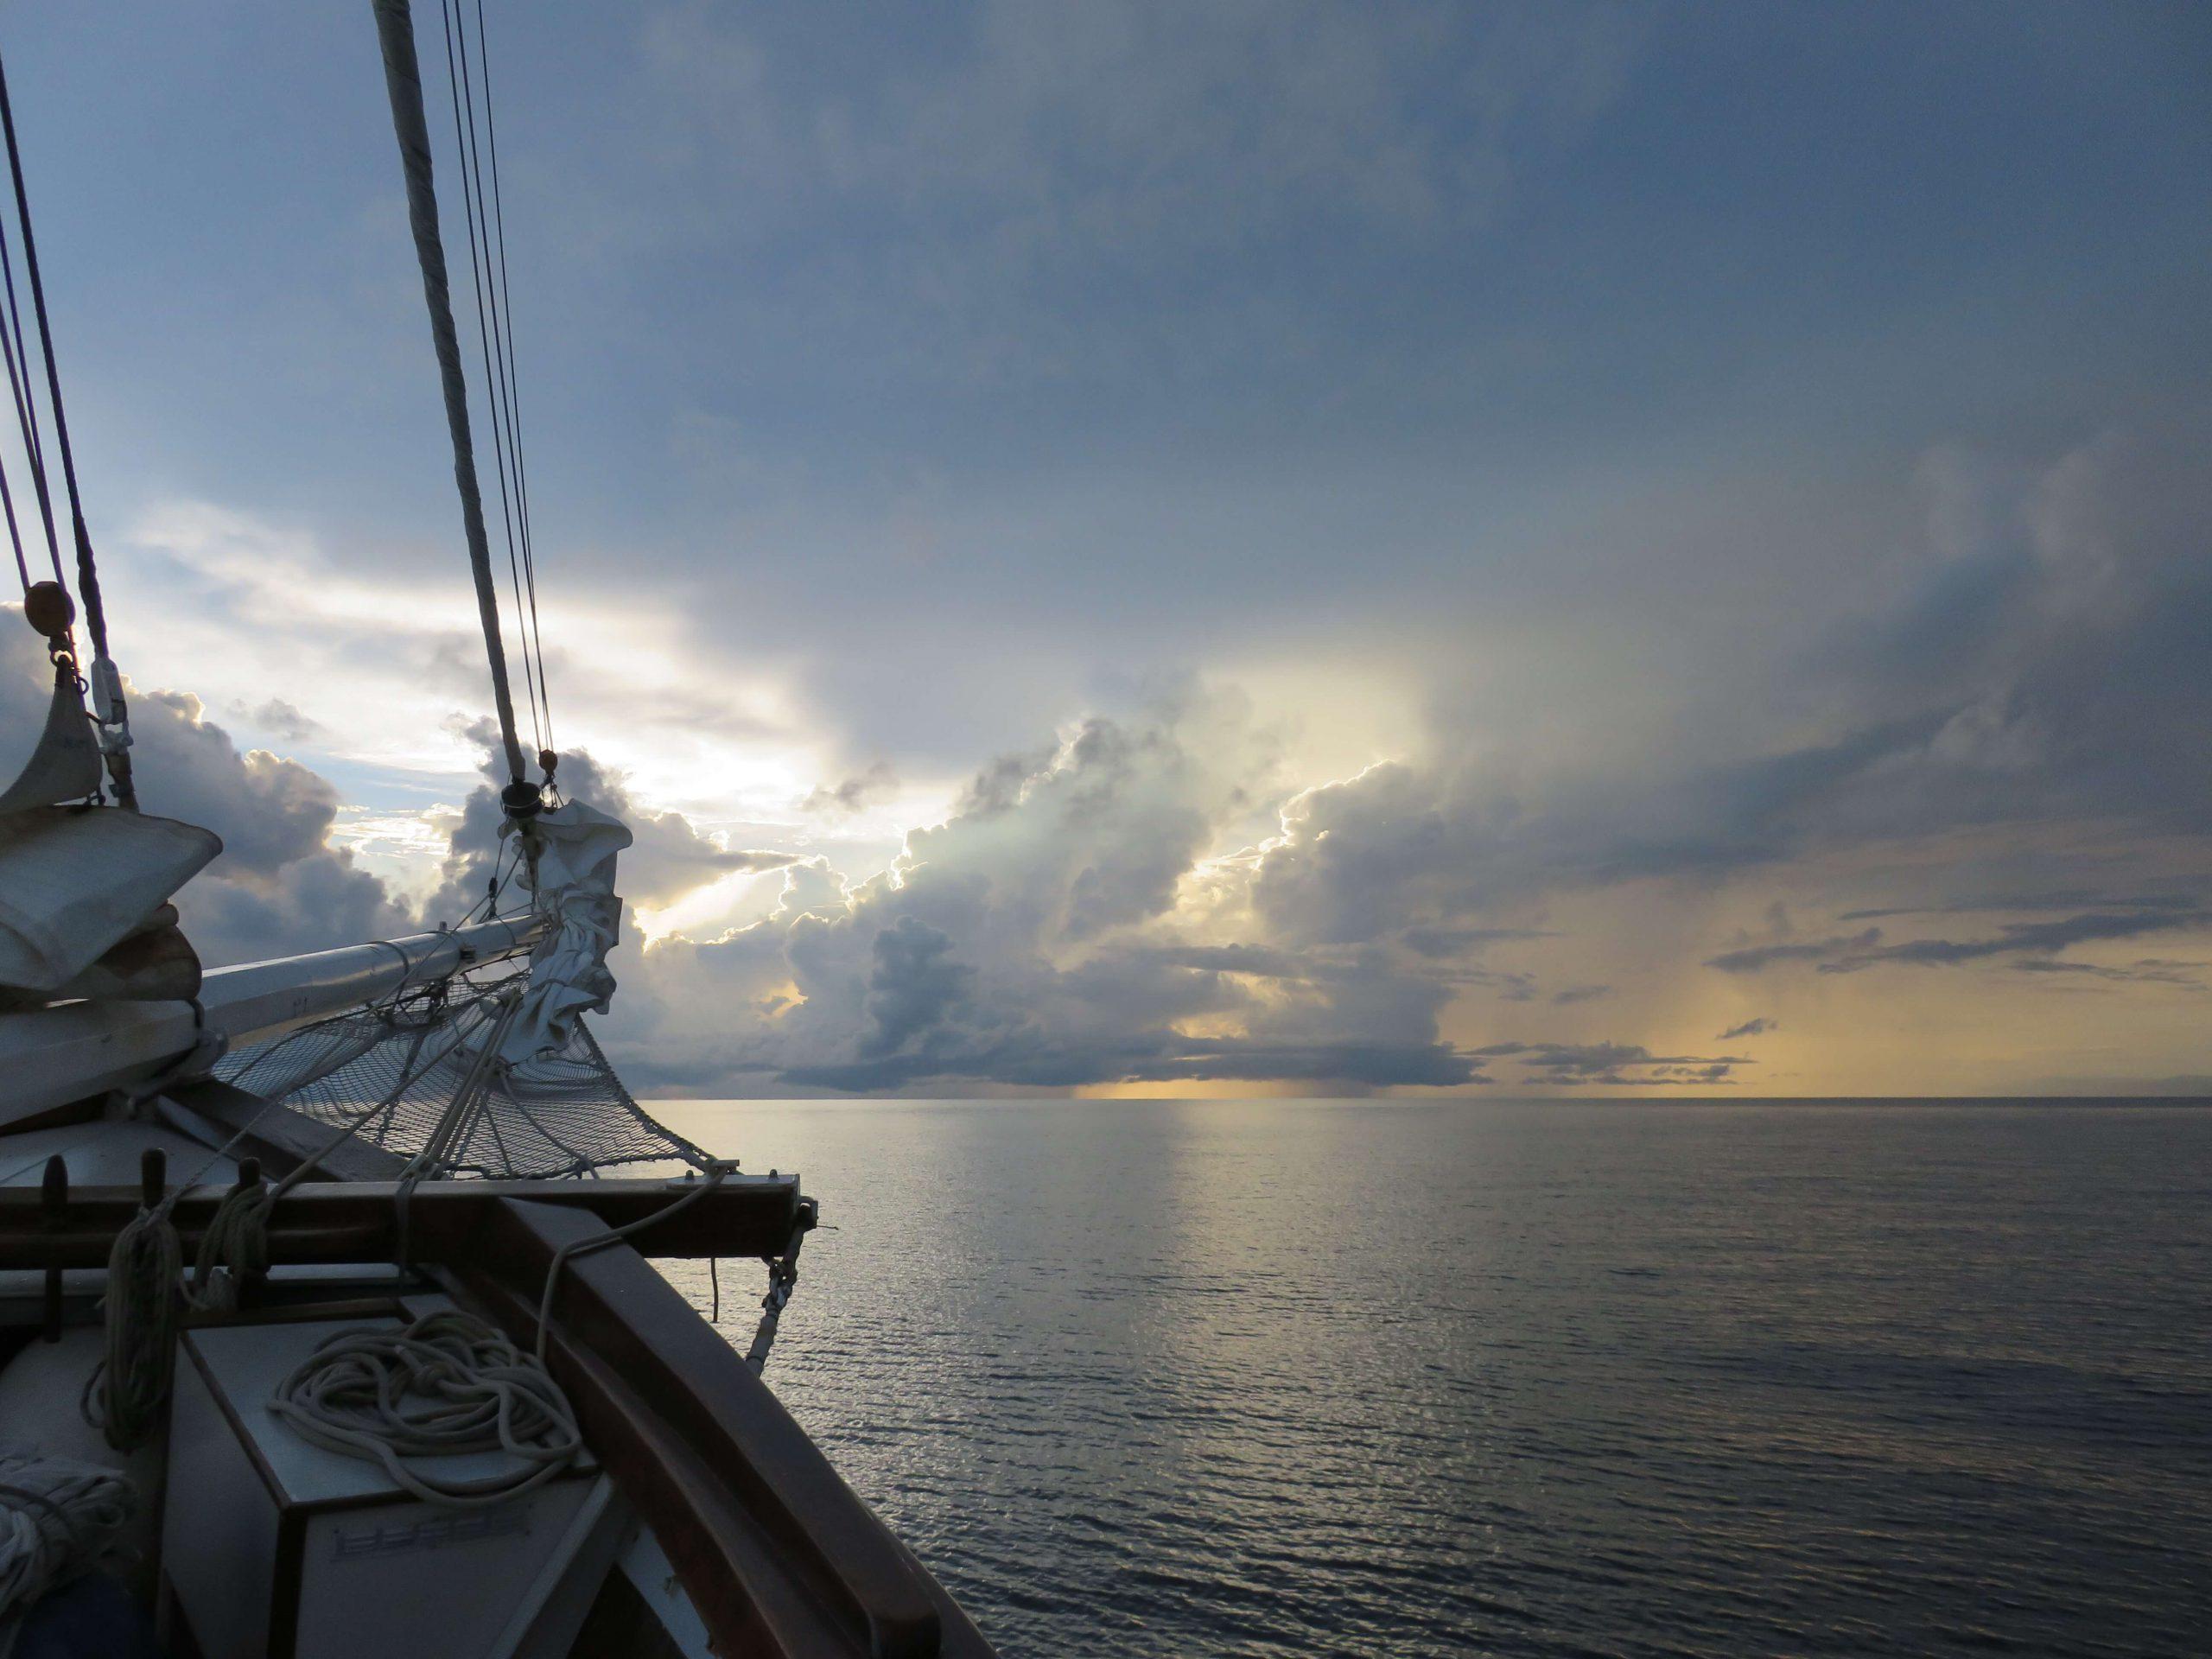 Adrift on the Bismarck Sea